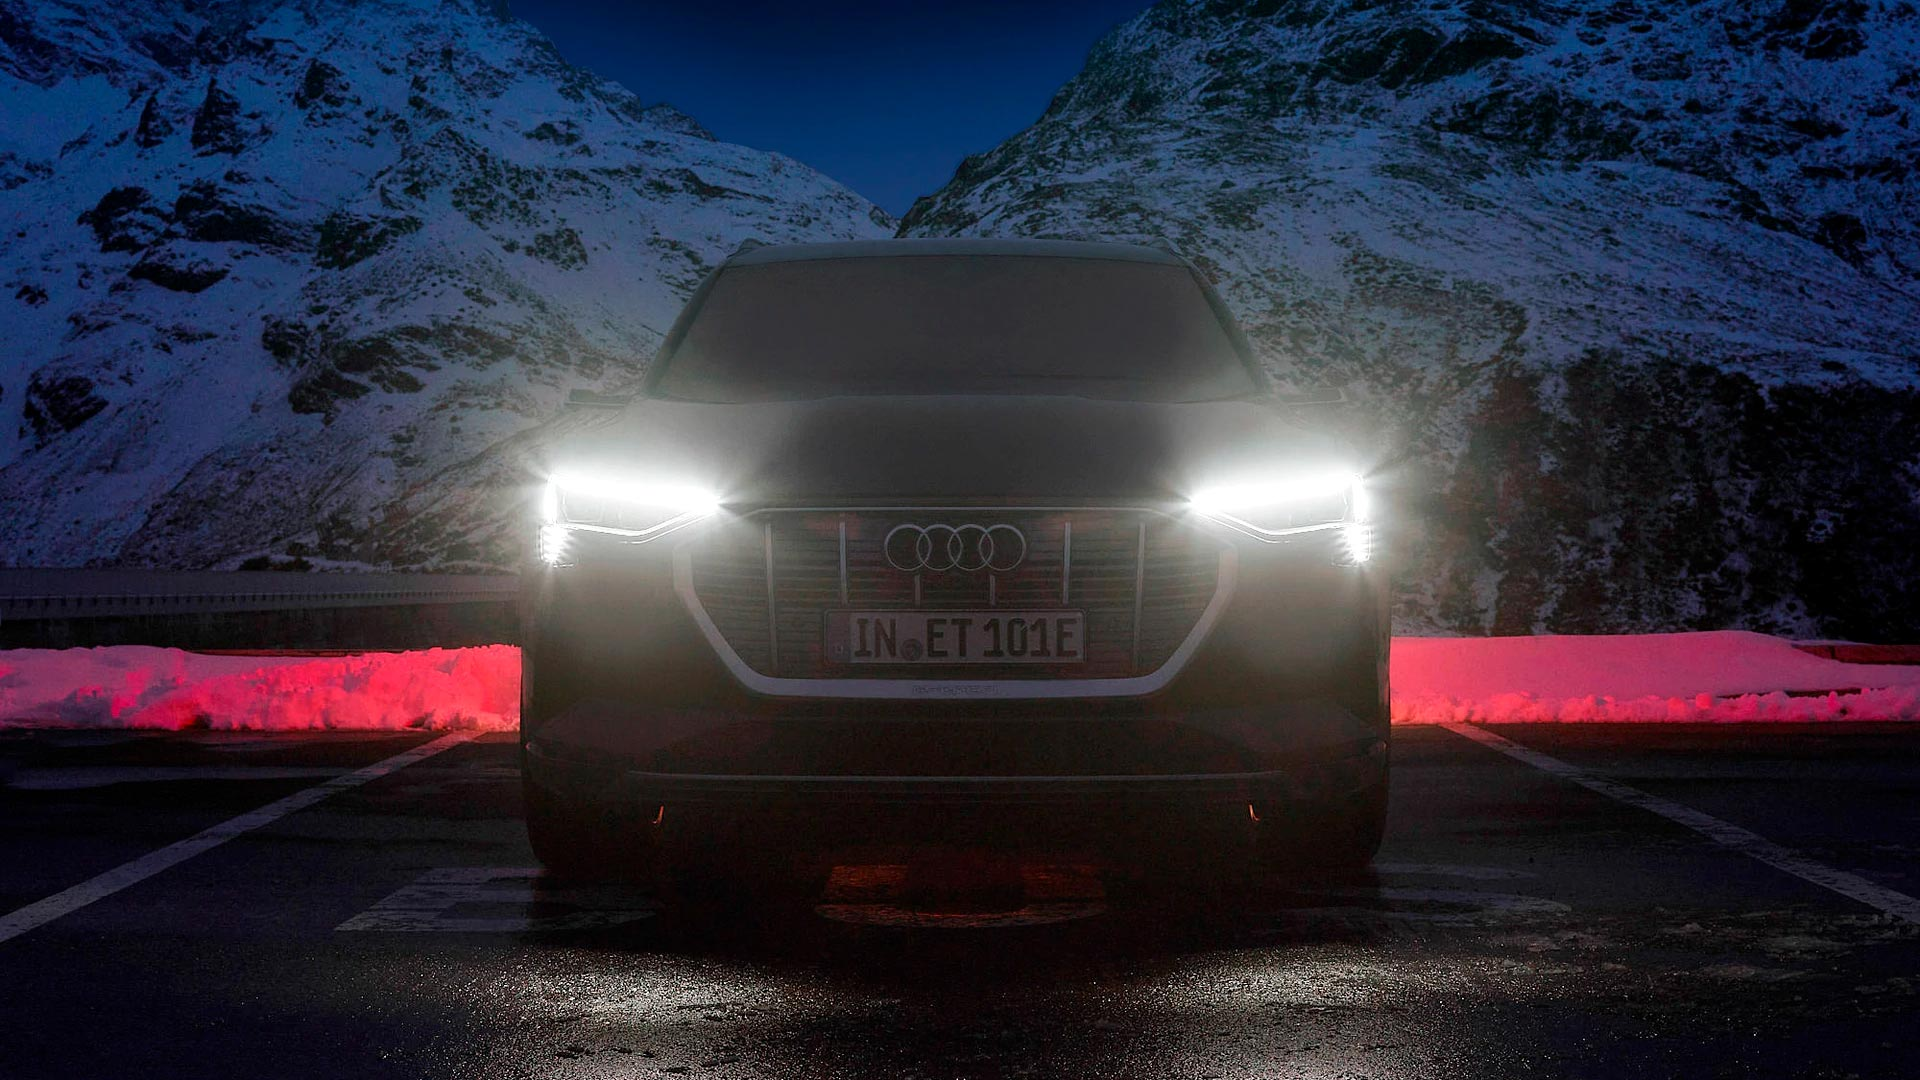 Audi Audi E-tron